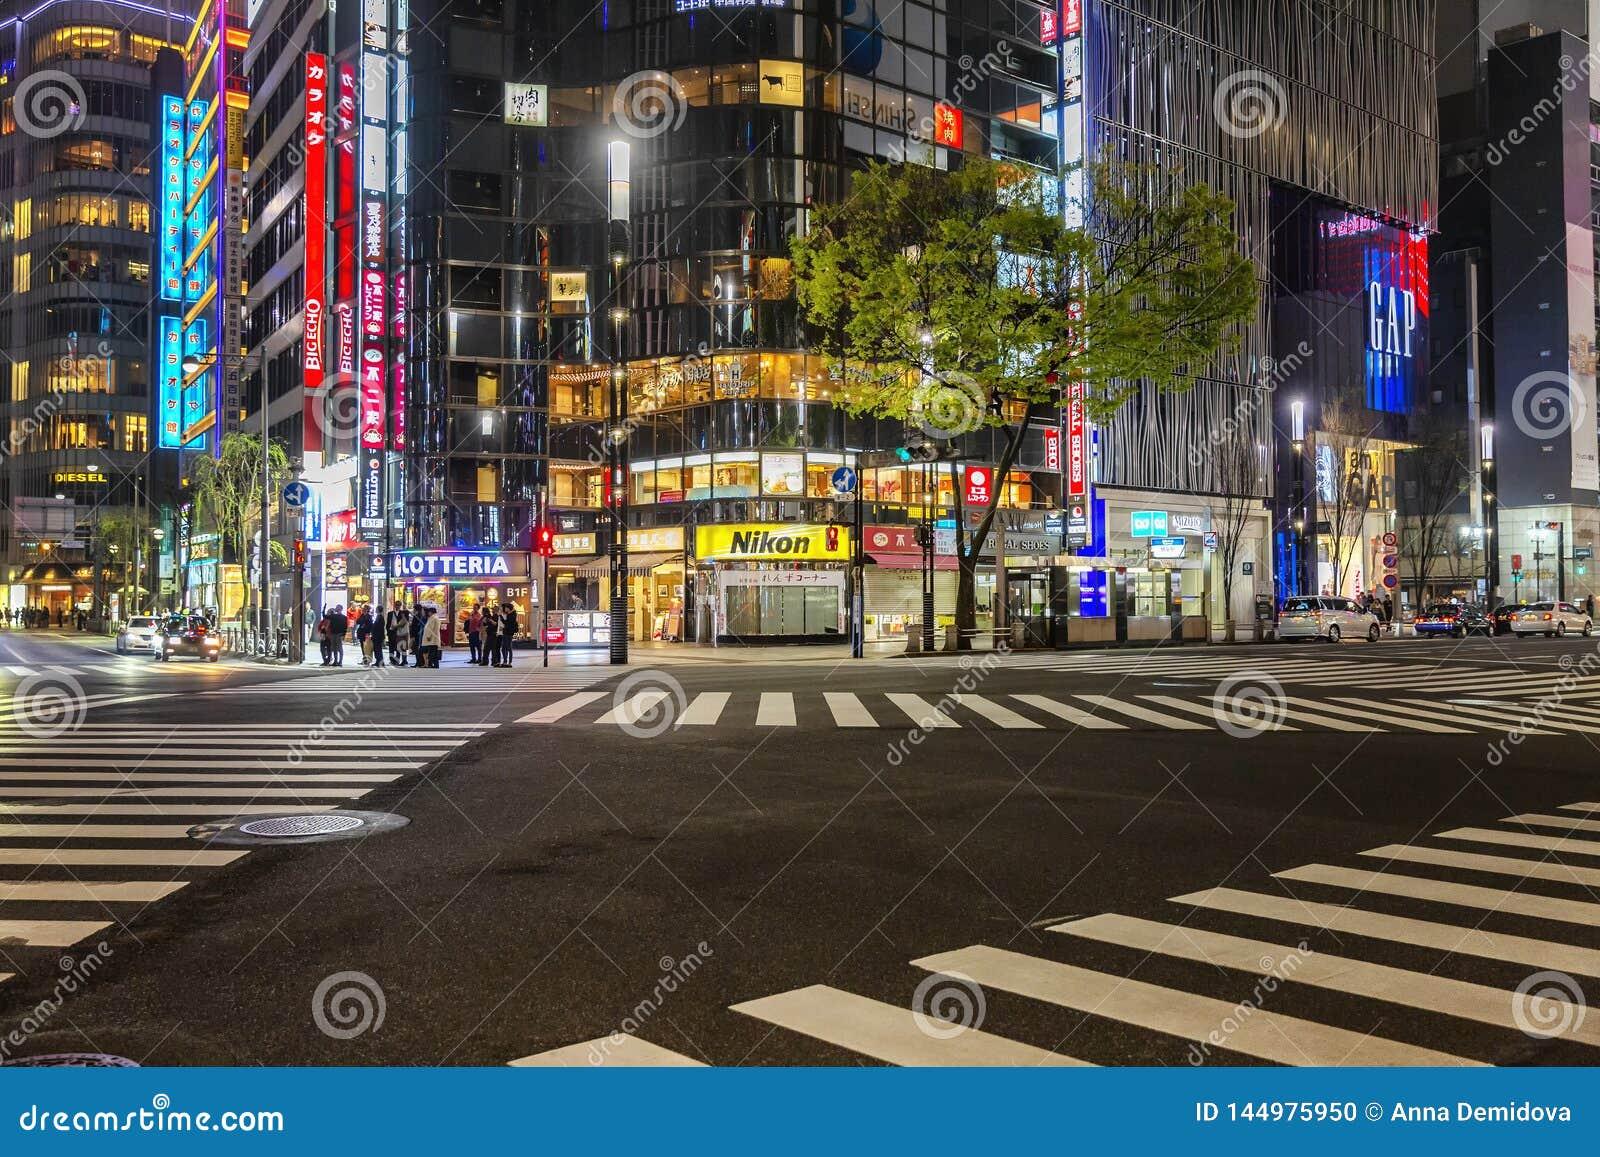 T?quio, Jap?o, 04/08/2017: Rua da noite da metr?pole